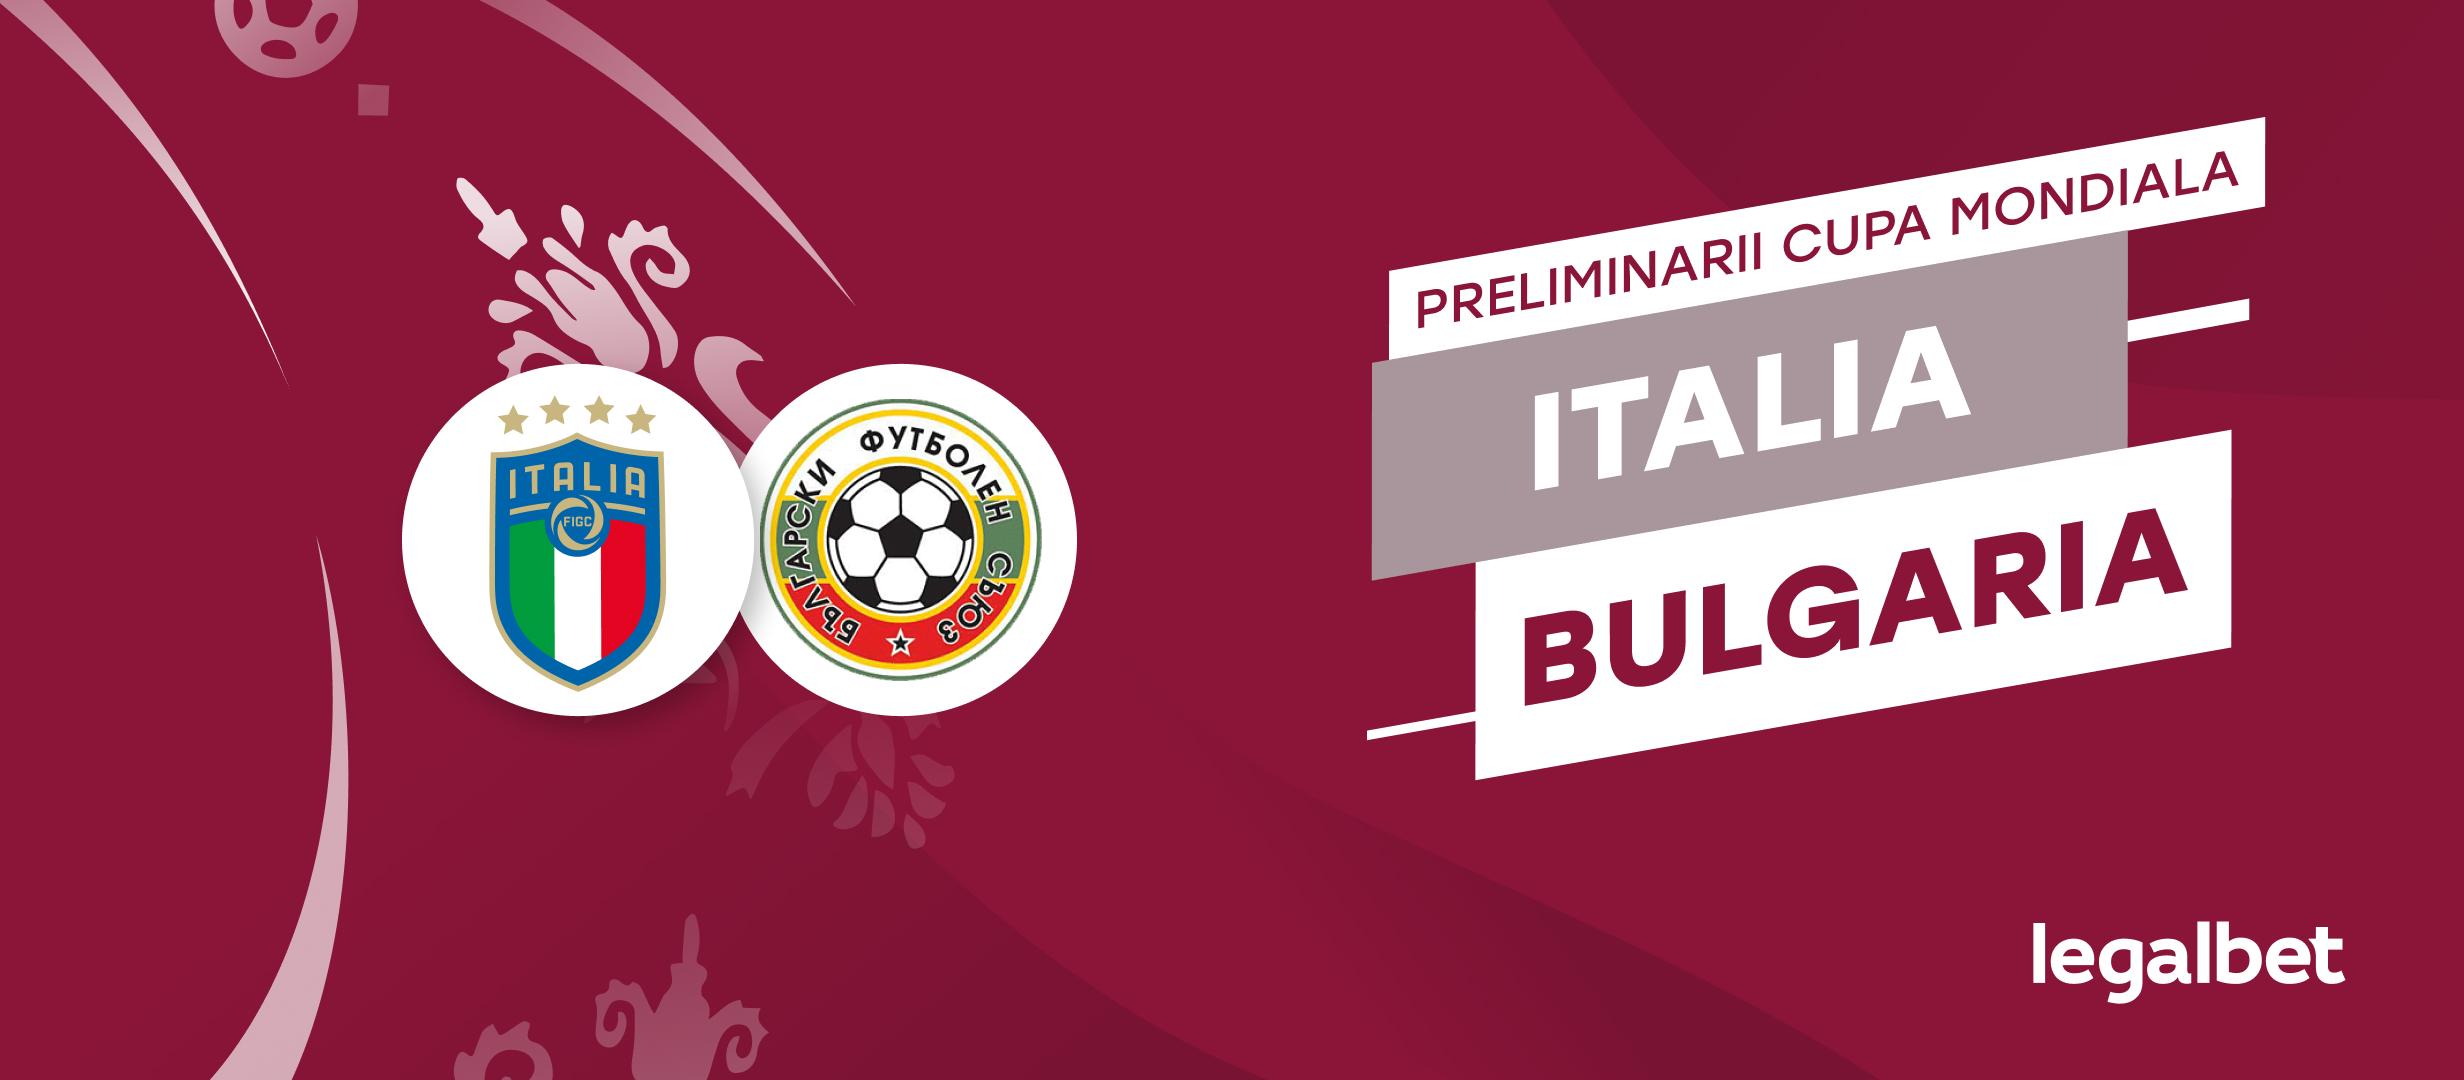 Italia - Bulgaria,  cote la pariuri, ponturi şi informaţii